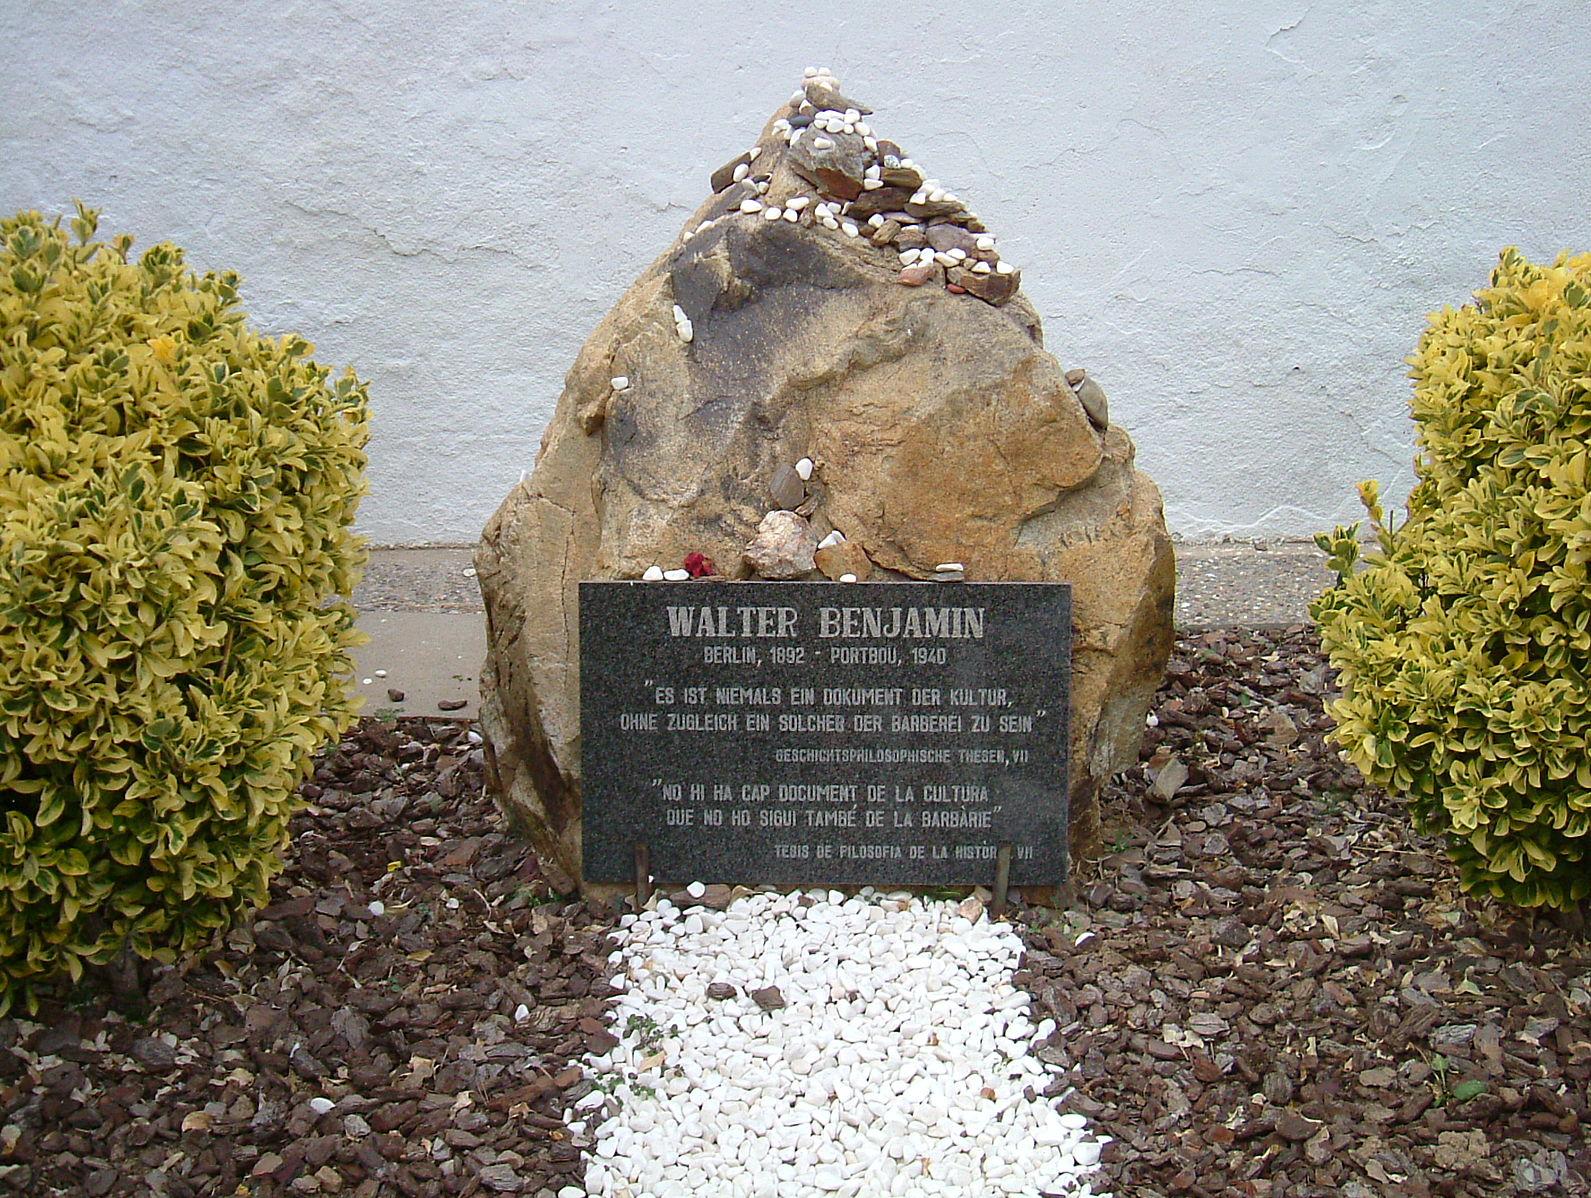 Memorial stone for Walter Benjamin in Portbou, Spain